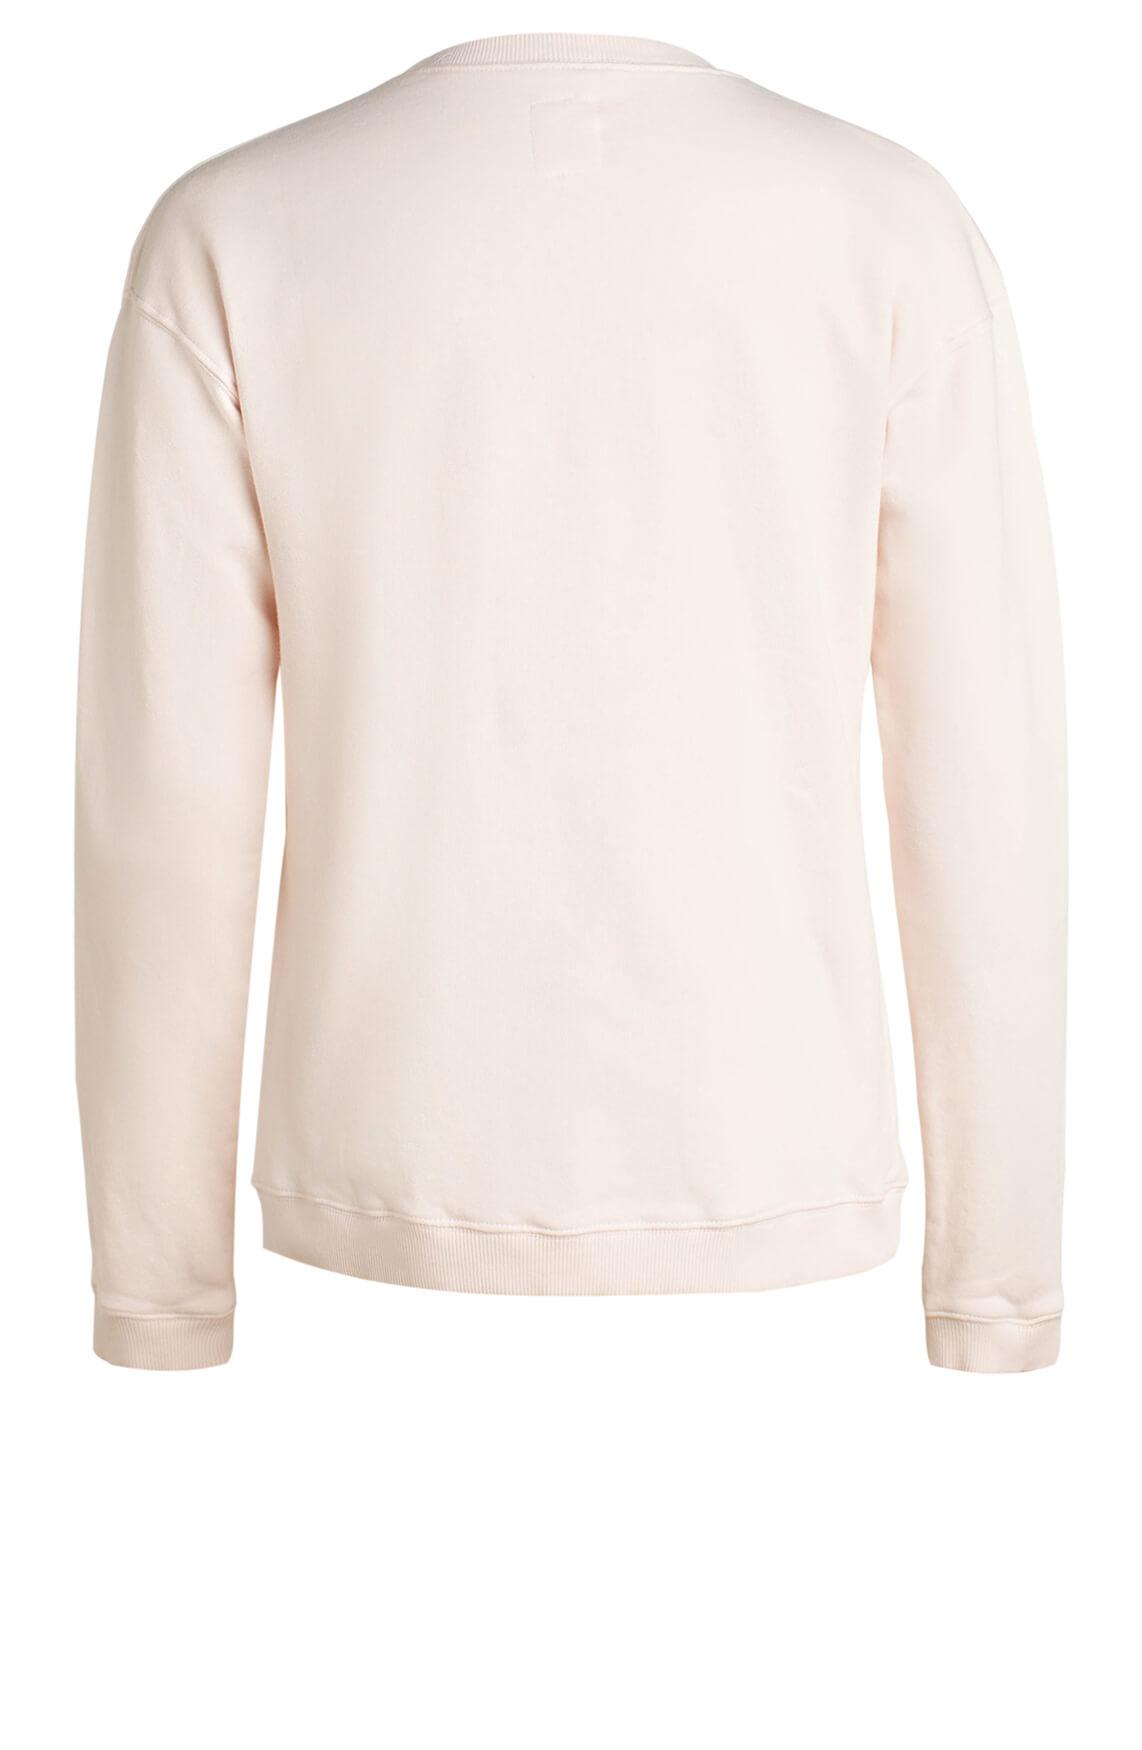 Lois Dames Sweater roze